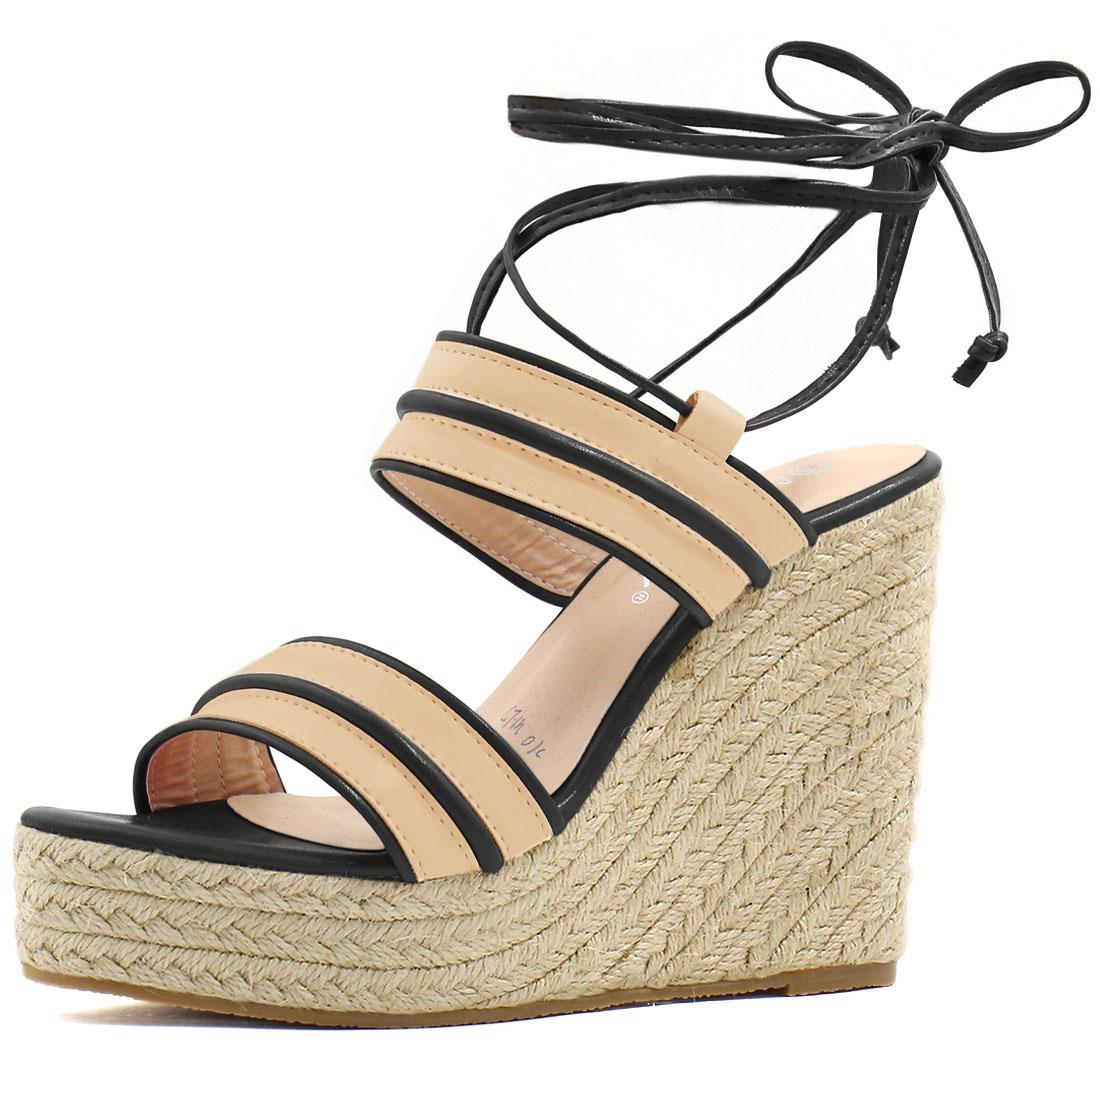 Women Striped Ankle Tie Espadrille Wedge Sandals Apricot Black US 9